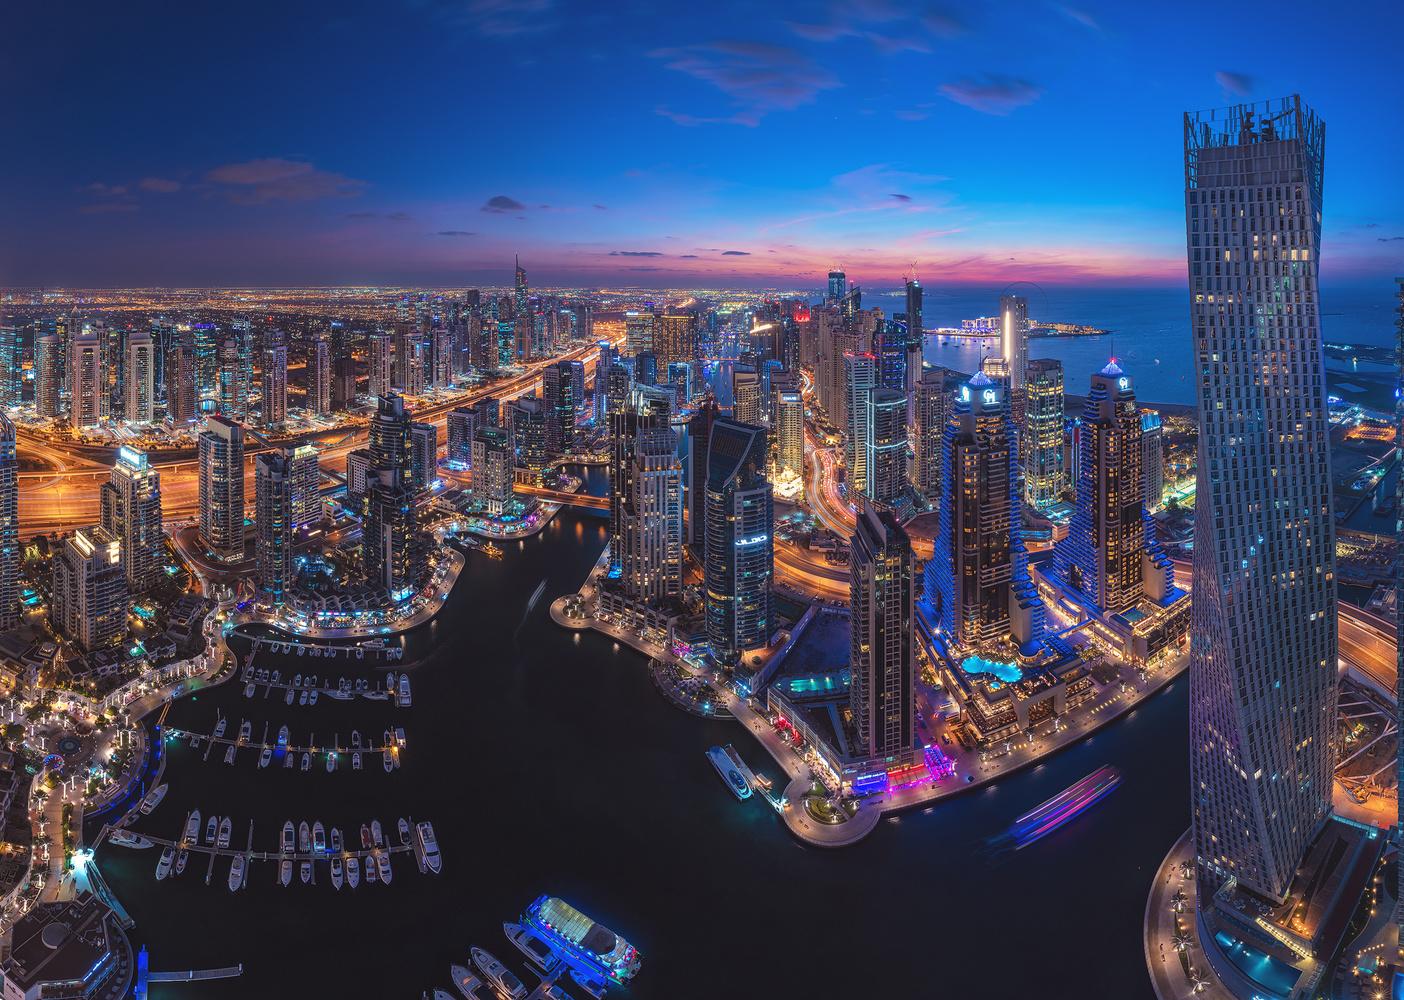 Dubai - Marina Skyline Panorama by Jean Claude Castor